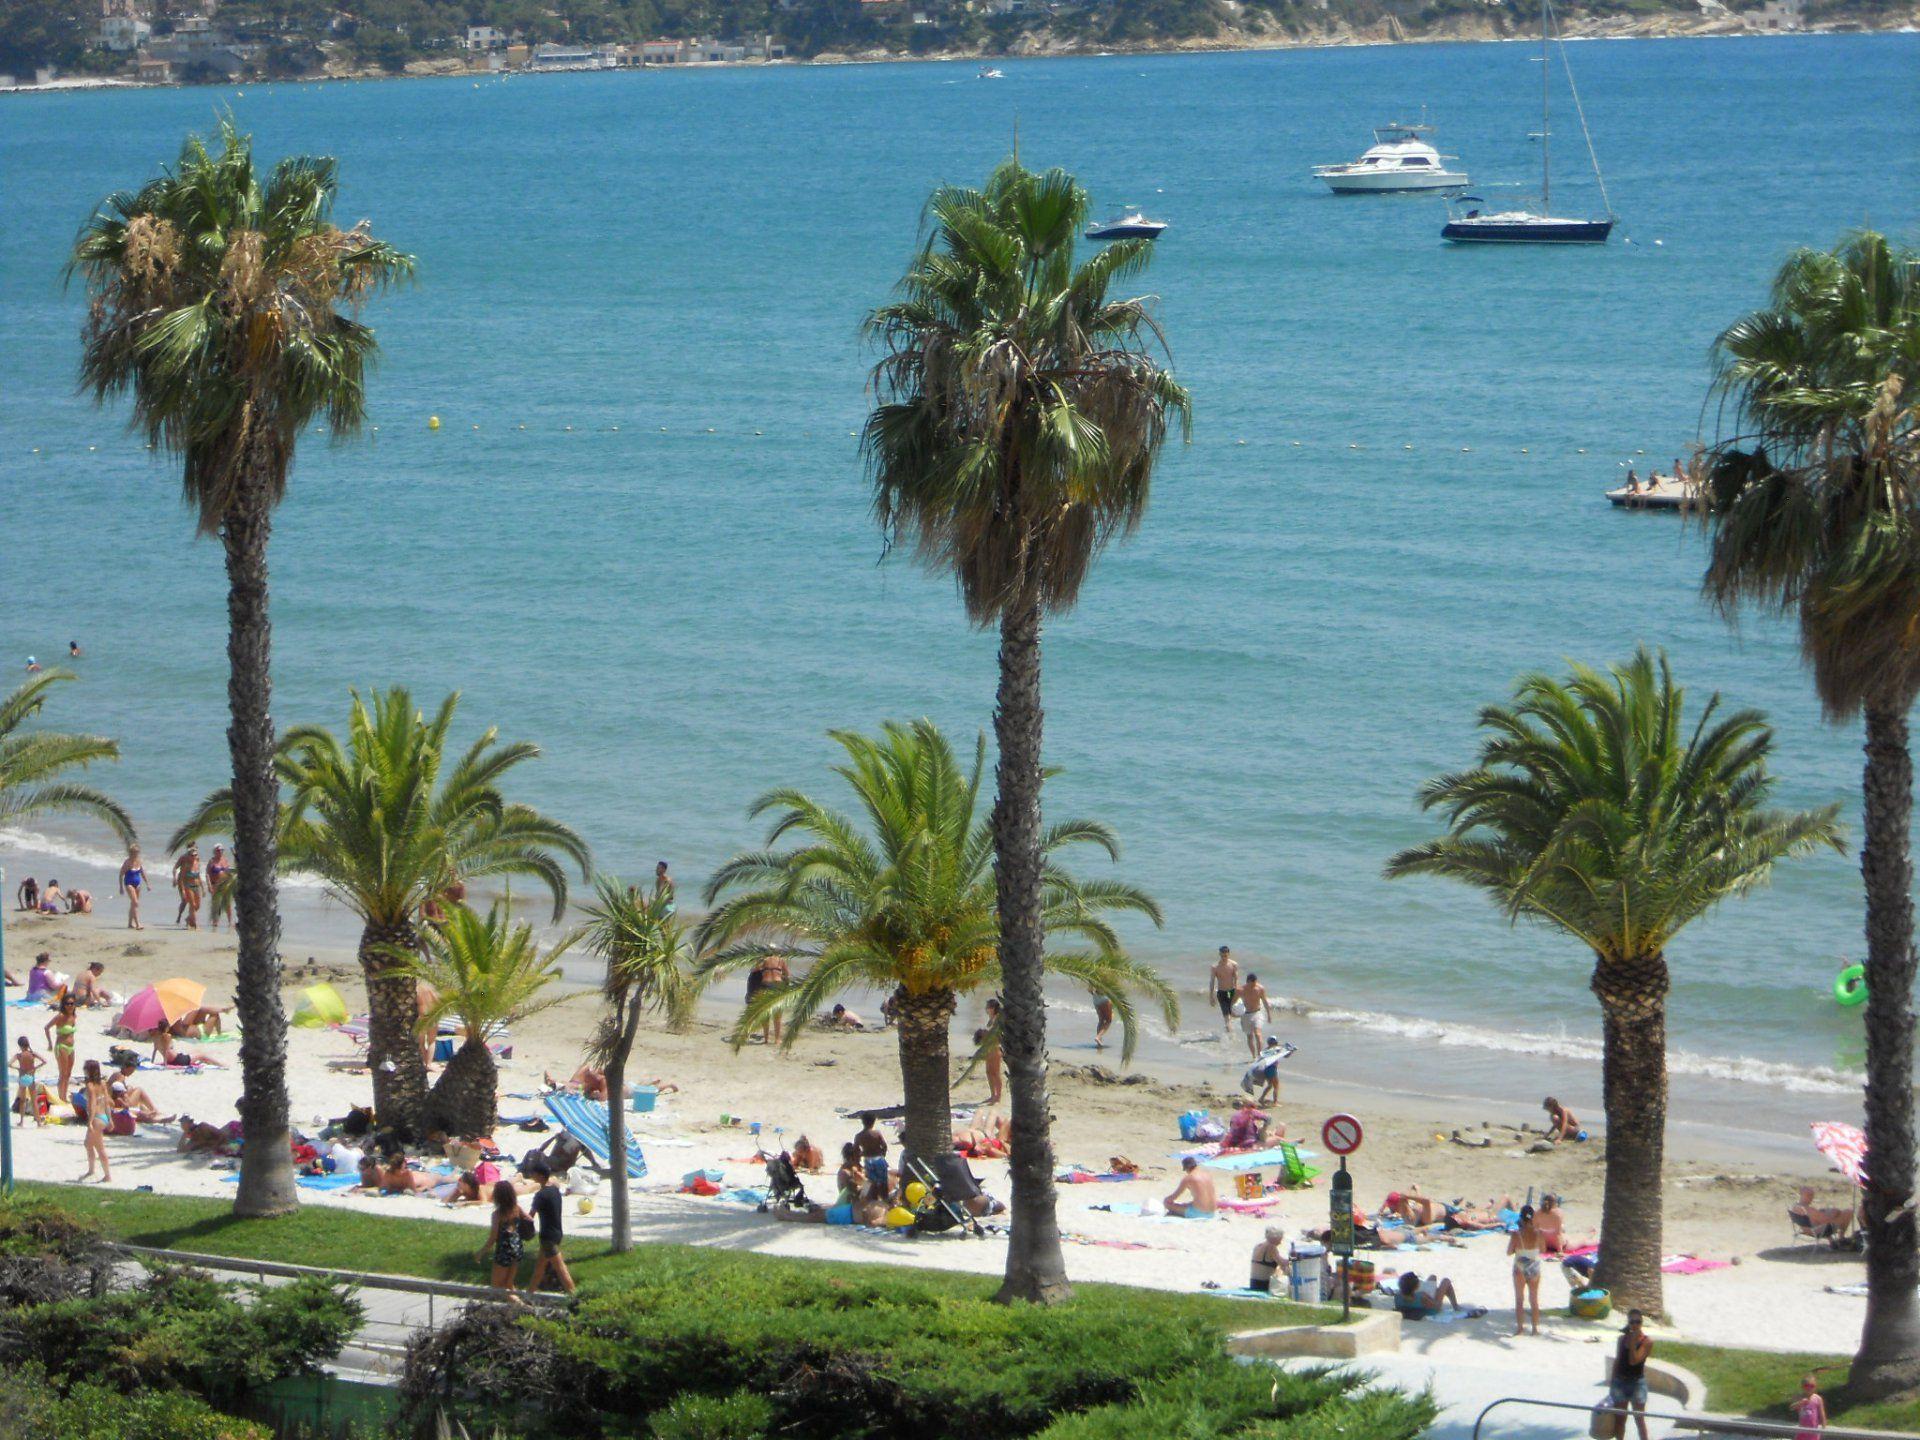 Grand Vallat Beach in Bandol - Var - France - Plages.tv